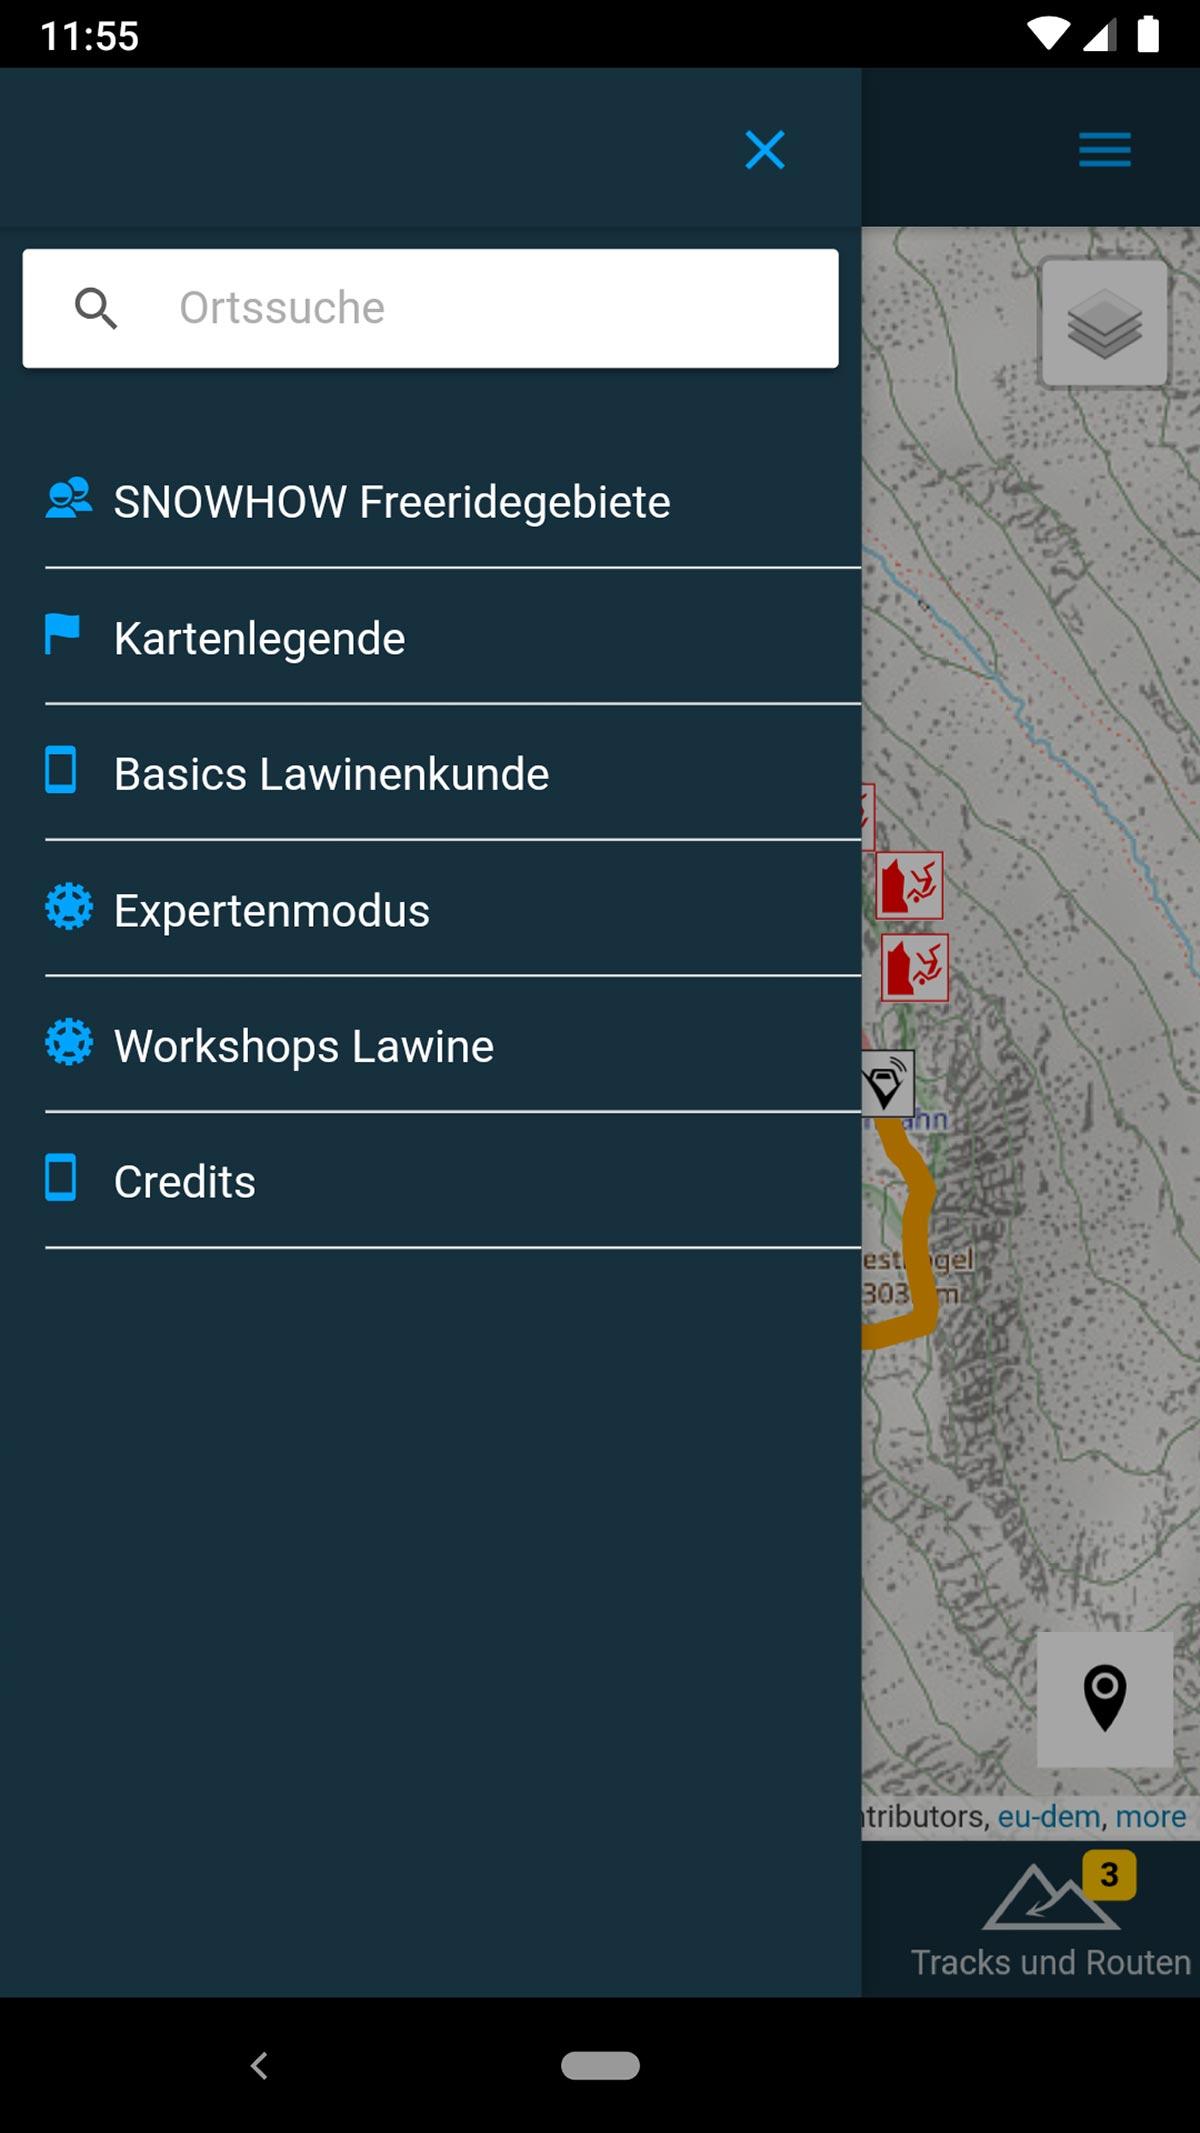 Snowhow App Freeride / Lawinen